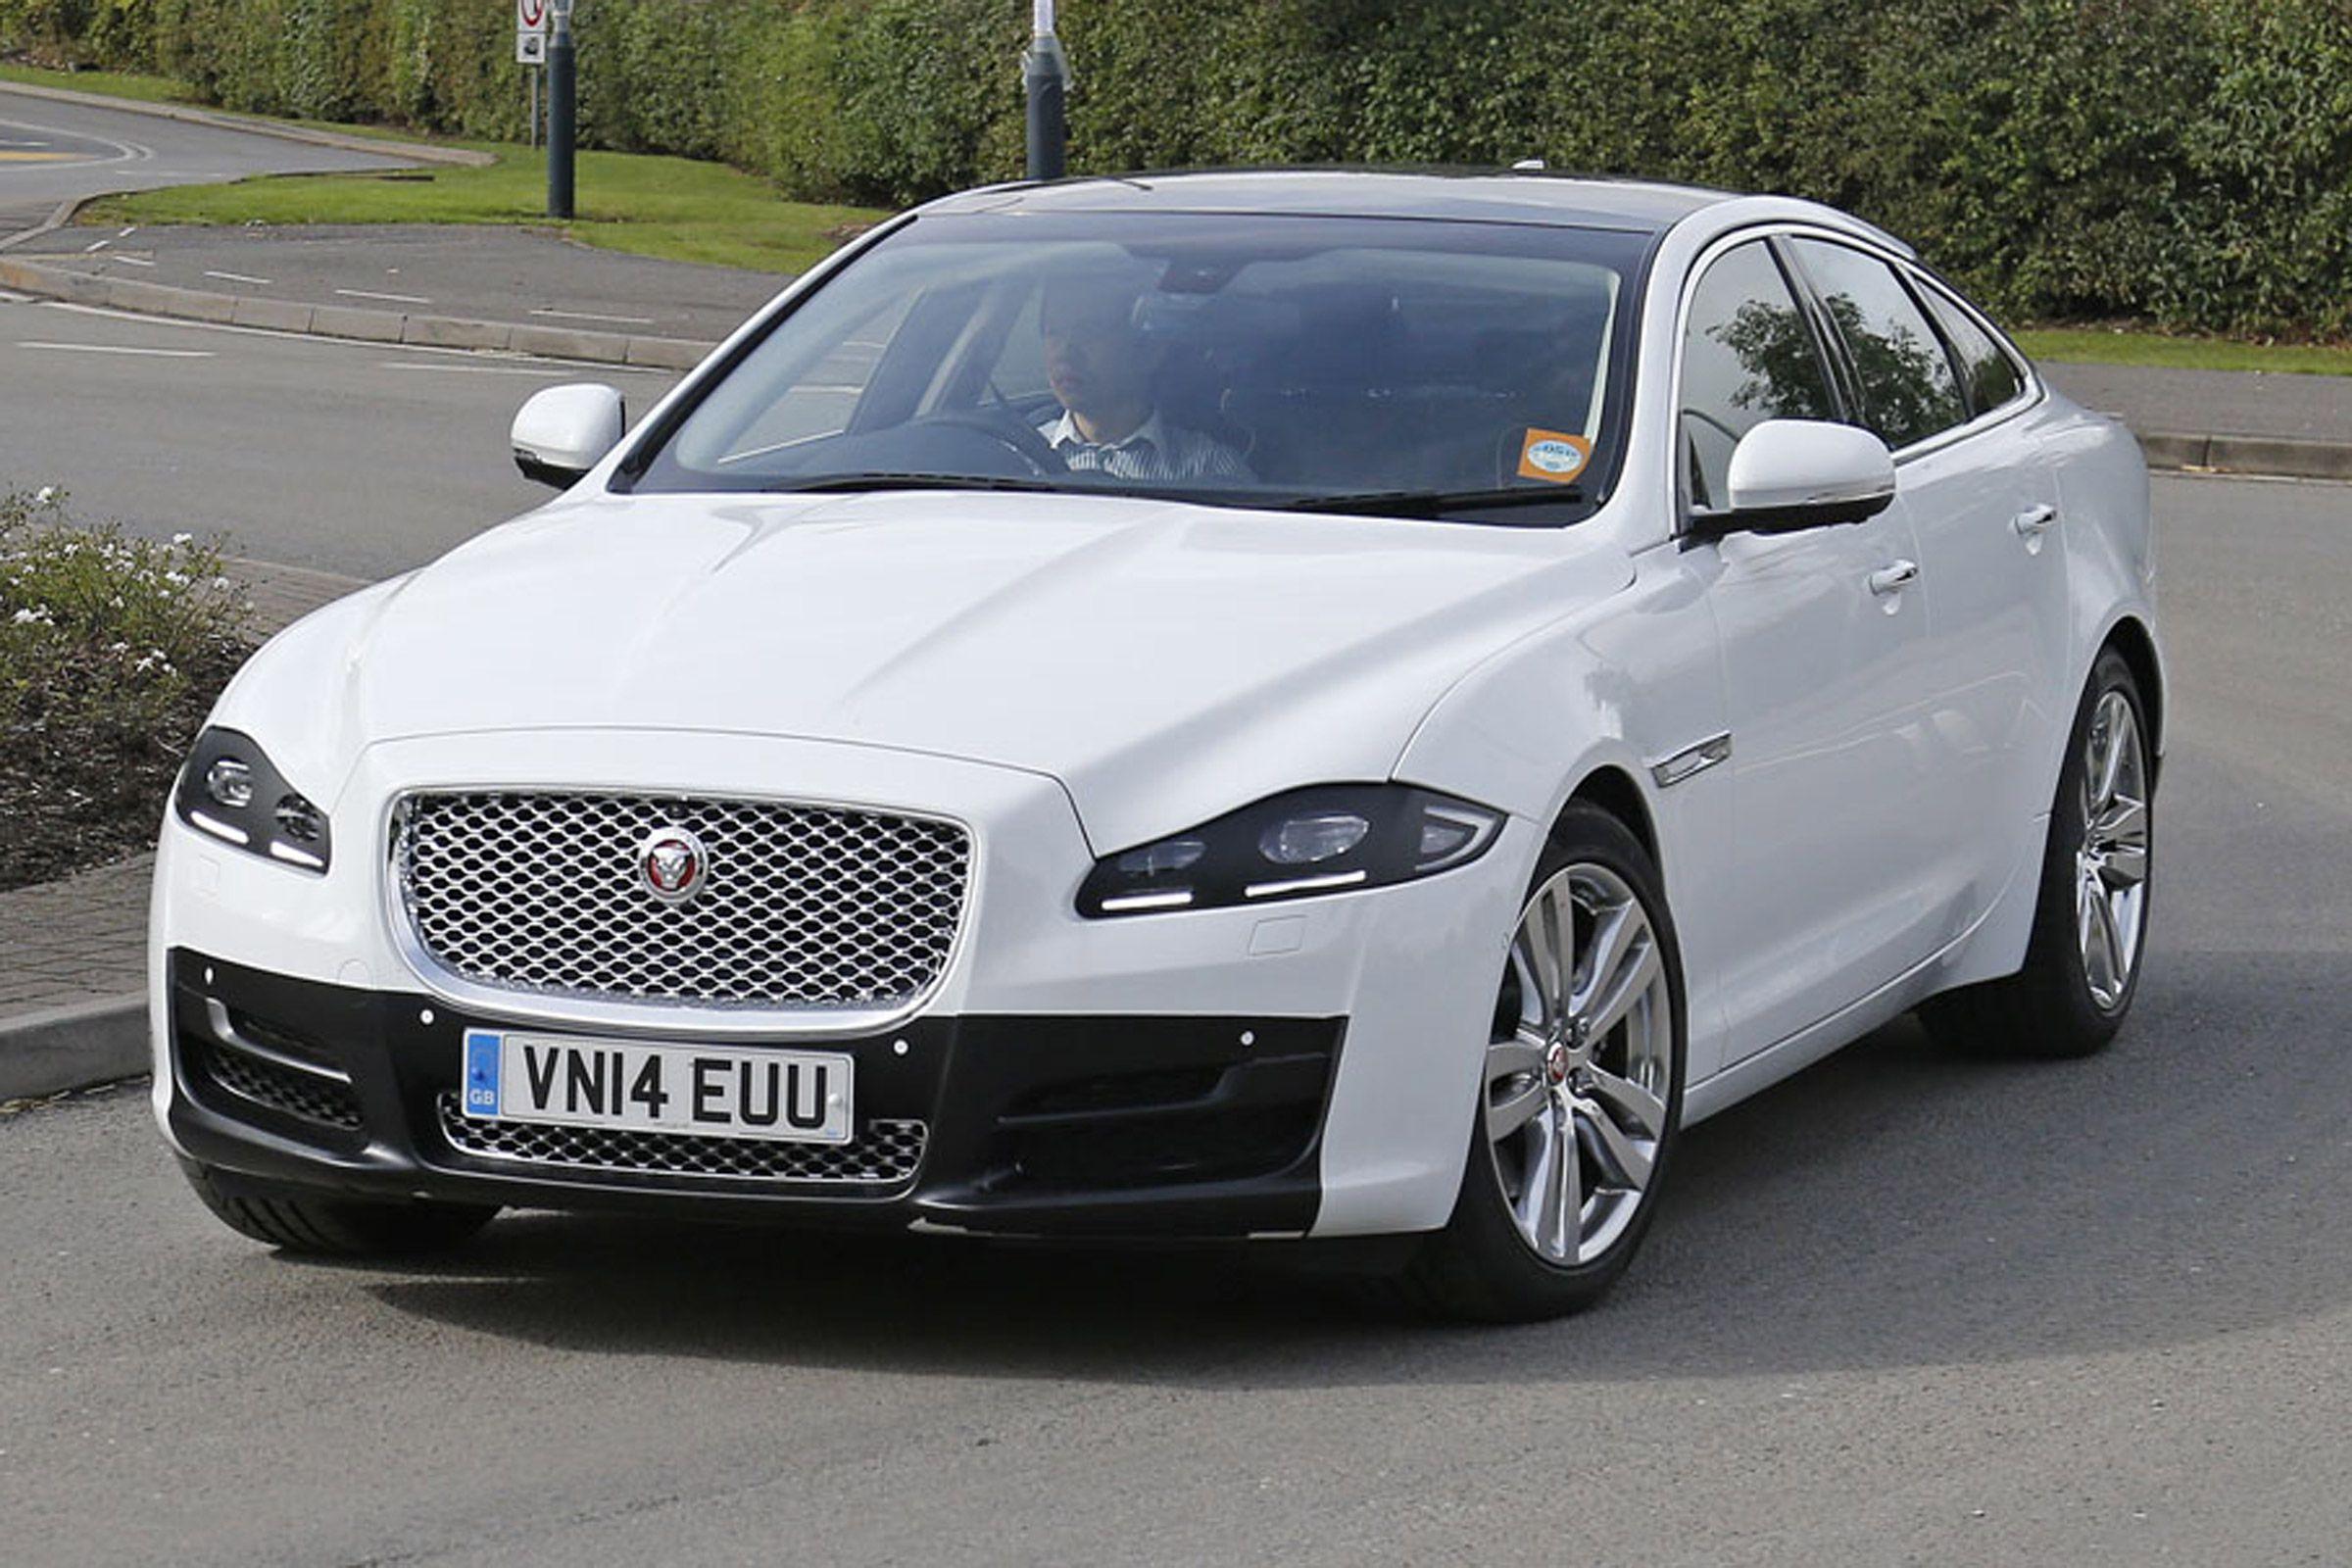 Jaguar Xj Widescreen